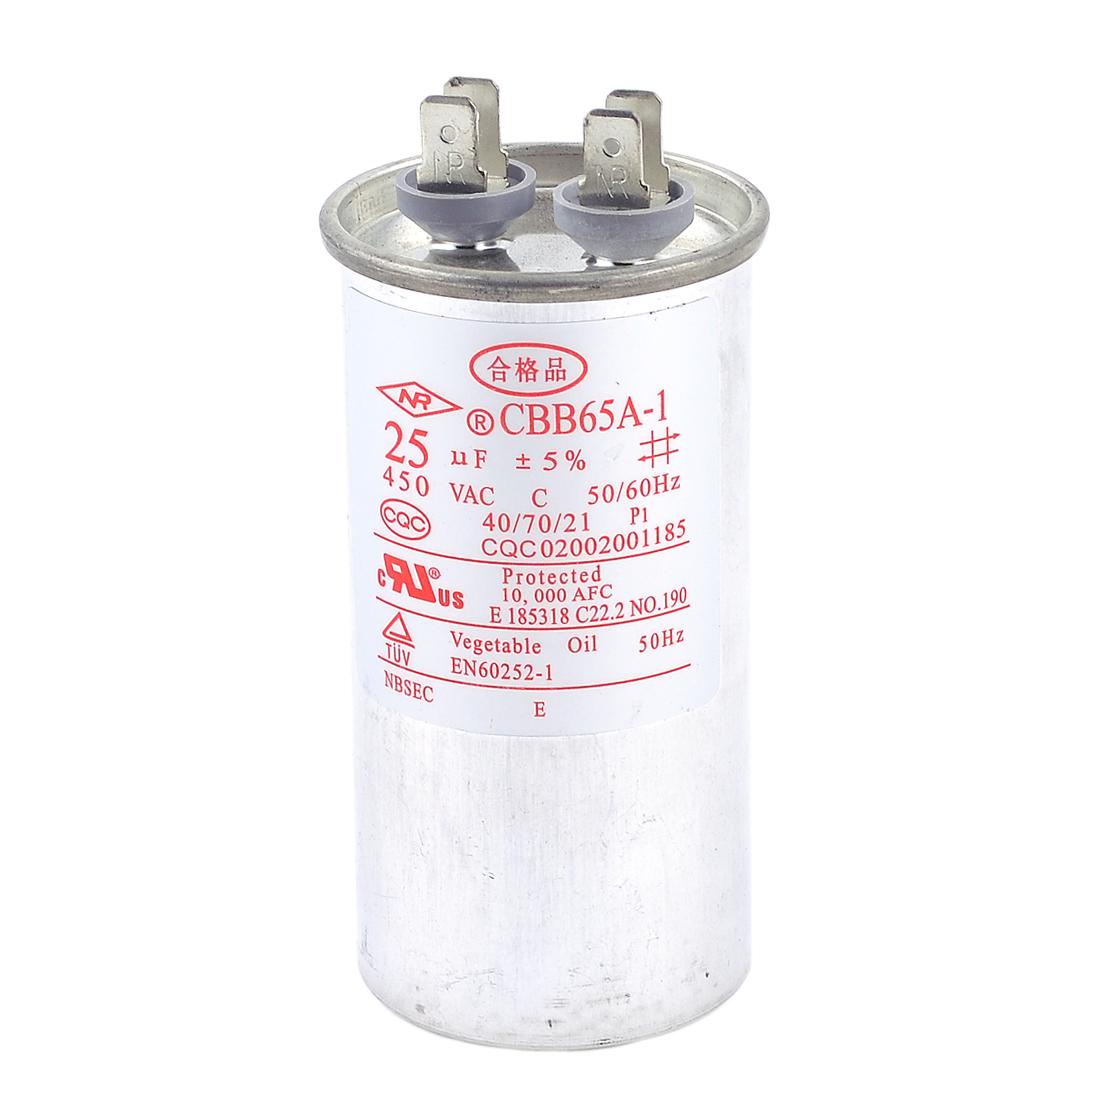 Generators AC450V 25 uF 4 Lug Terminals Cylinder Shape Motor Capacitor